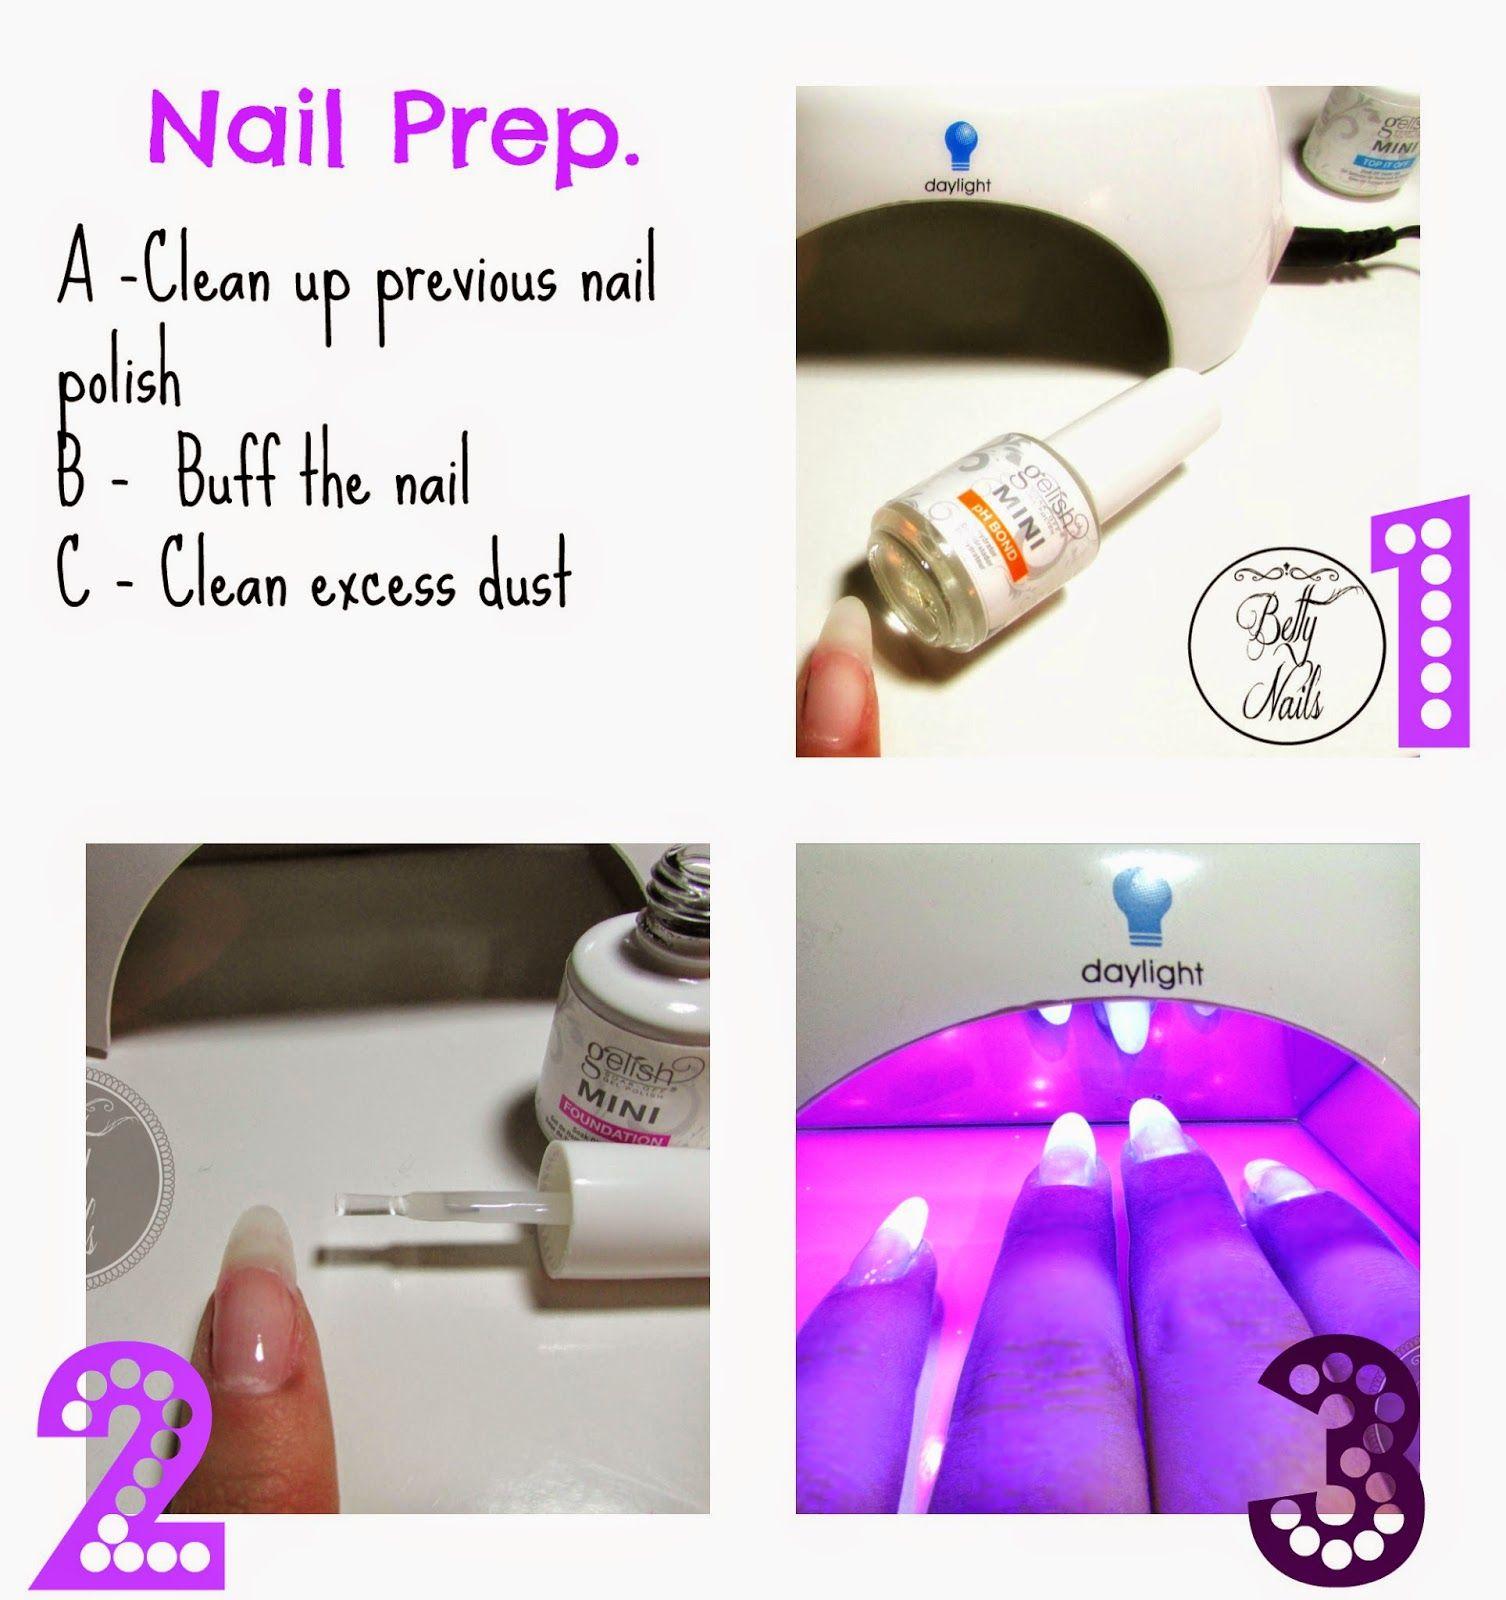 Betty Nails: GEL POLISH | Gelish Starters Kit + Mini Led Lamp + You ...